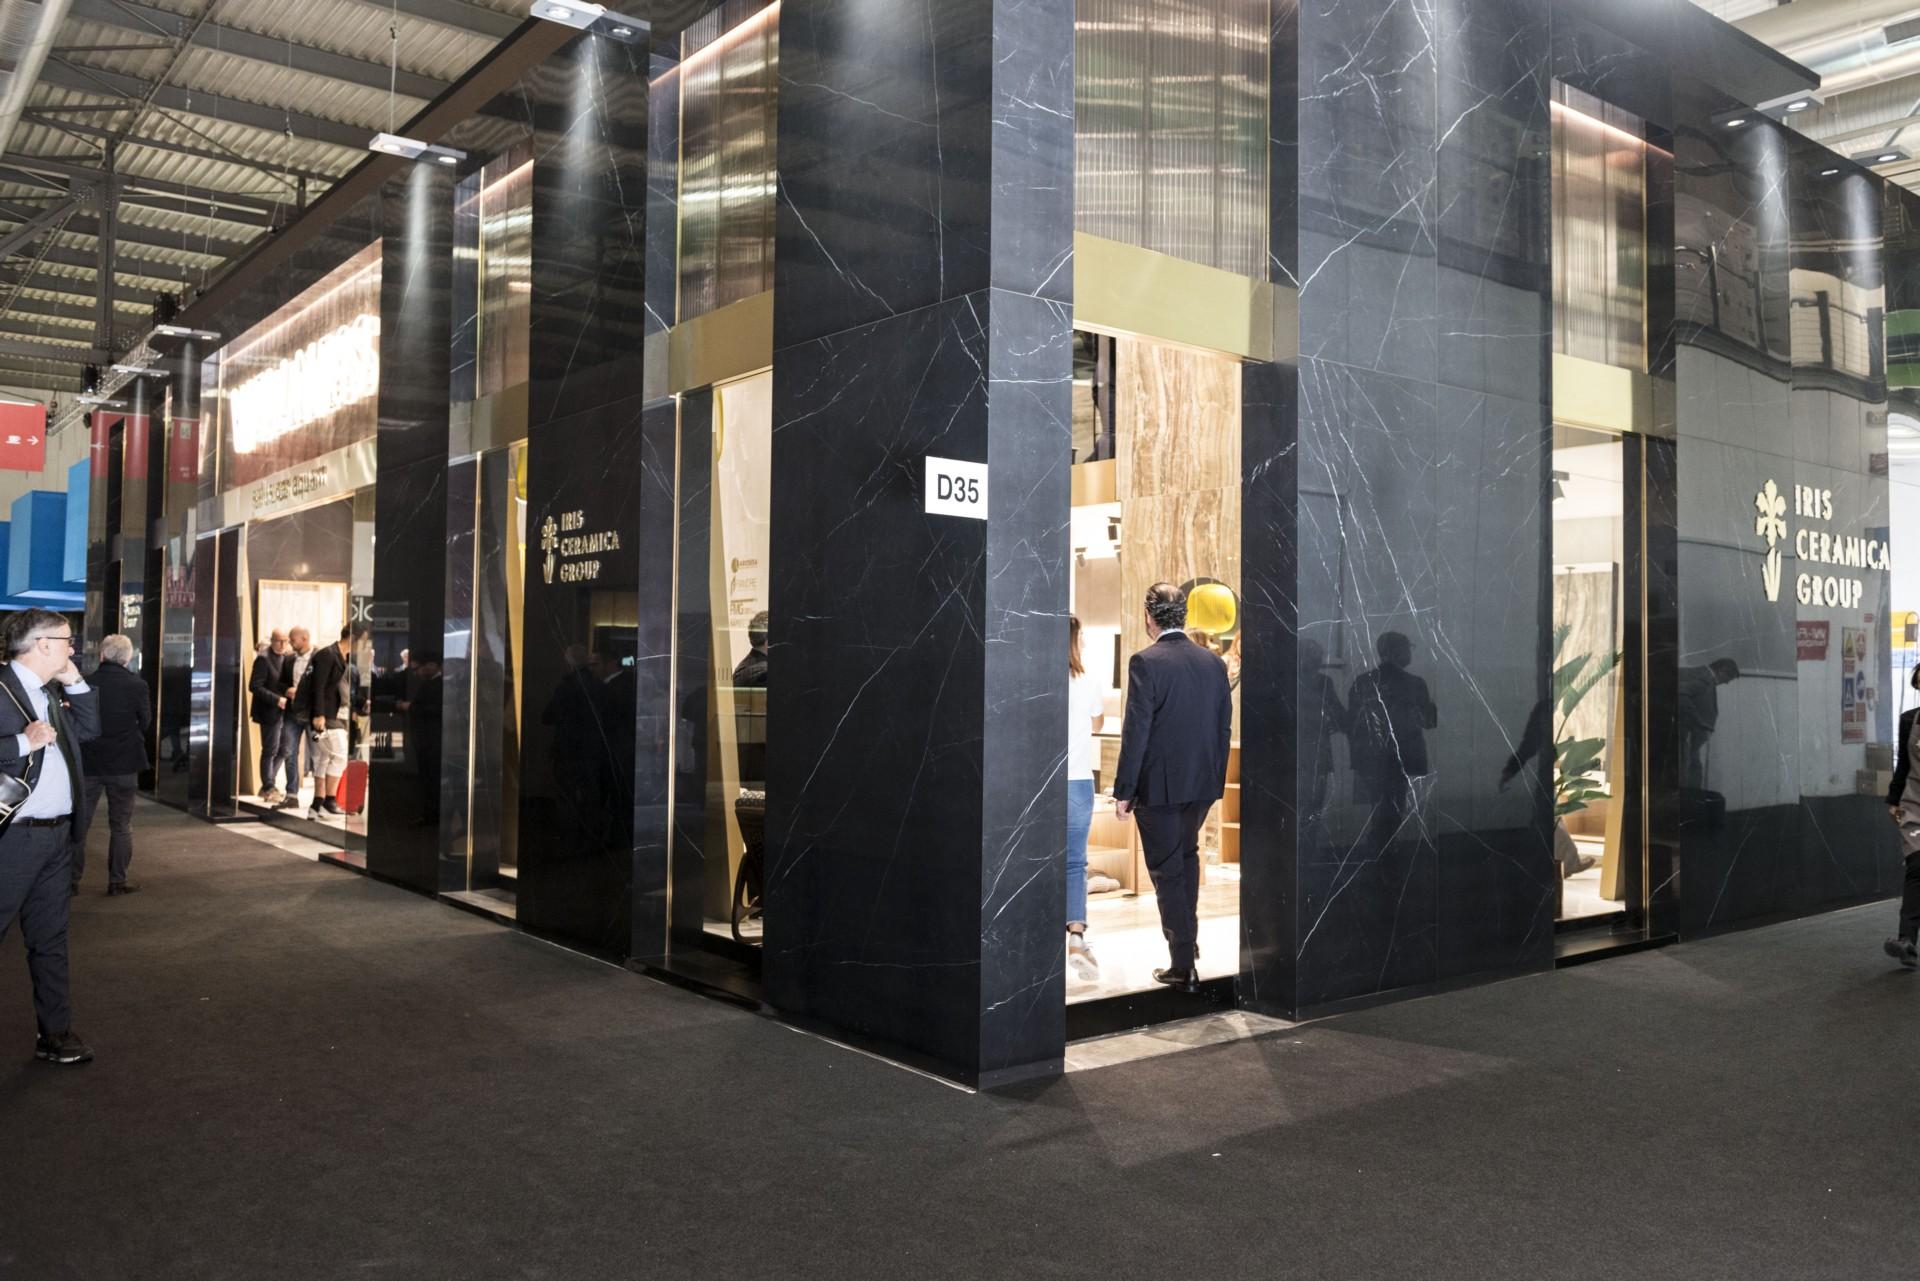 The Iris Ceramica Group at Salone del Mobile and Fuorisalone, Milan 2018